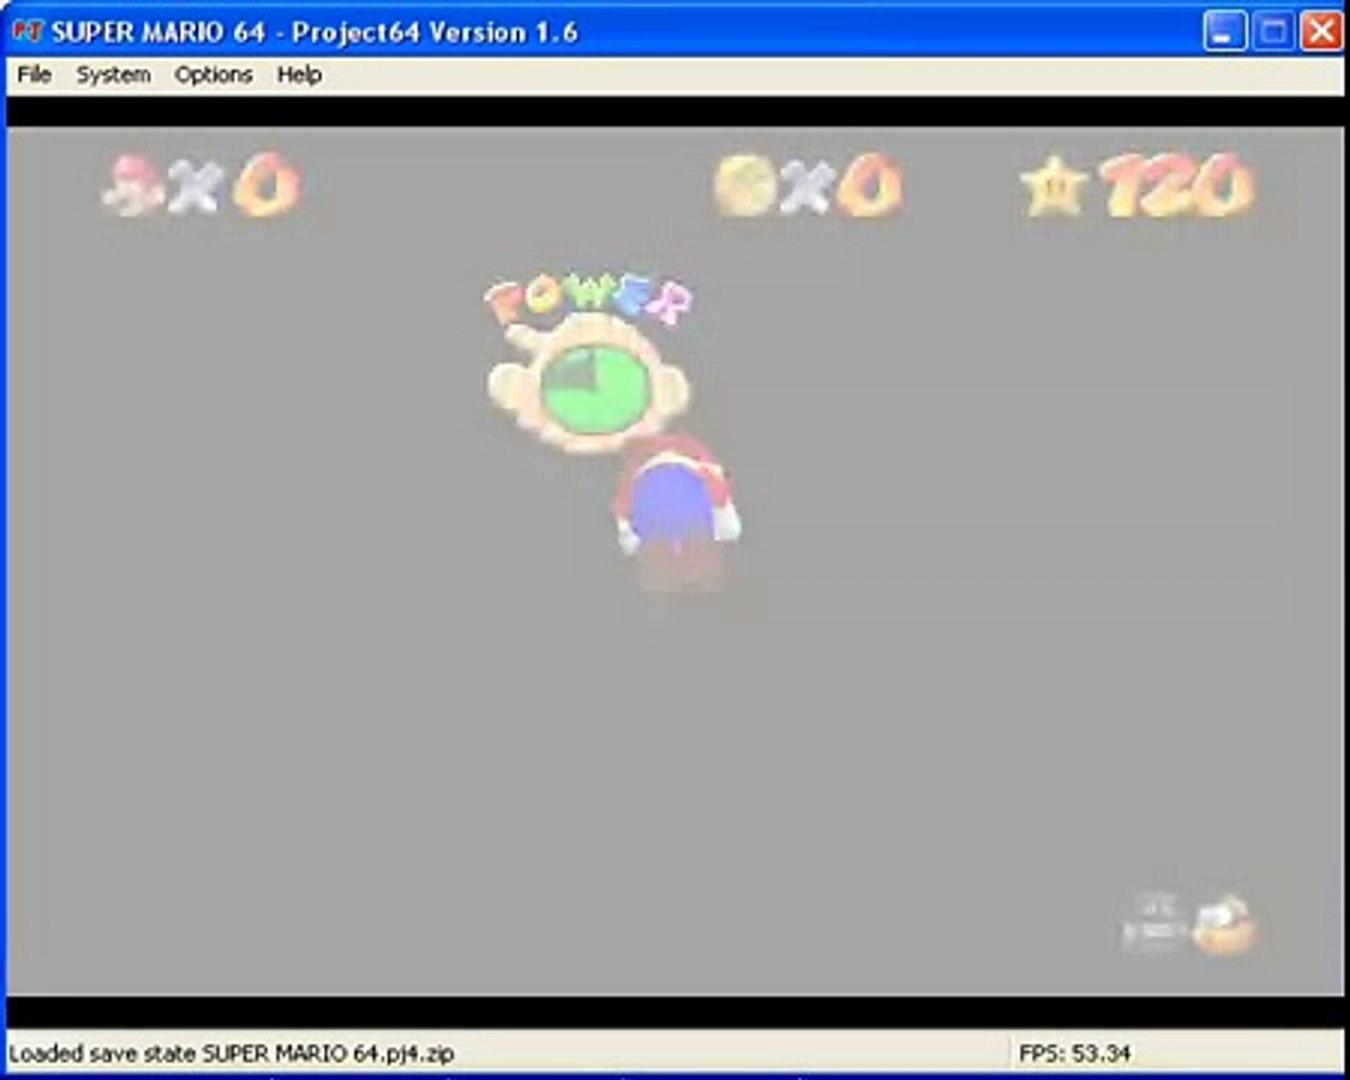 Super Mario 64 - Swimming Beast in the Cavern - 17''60